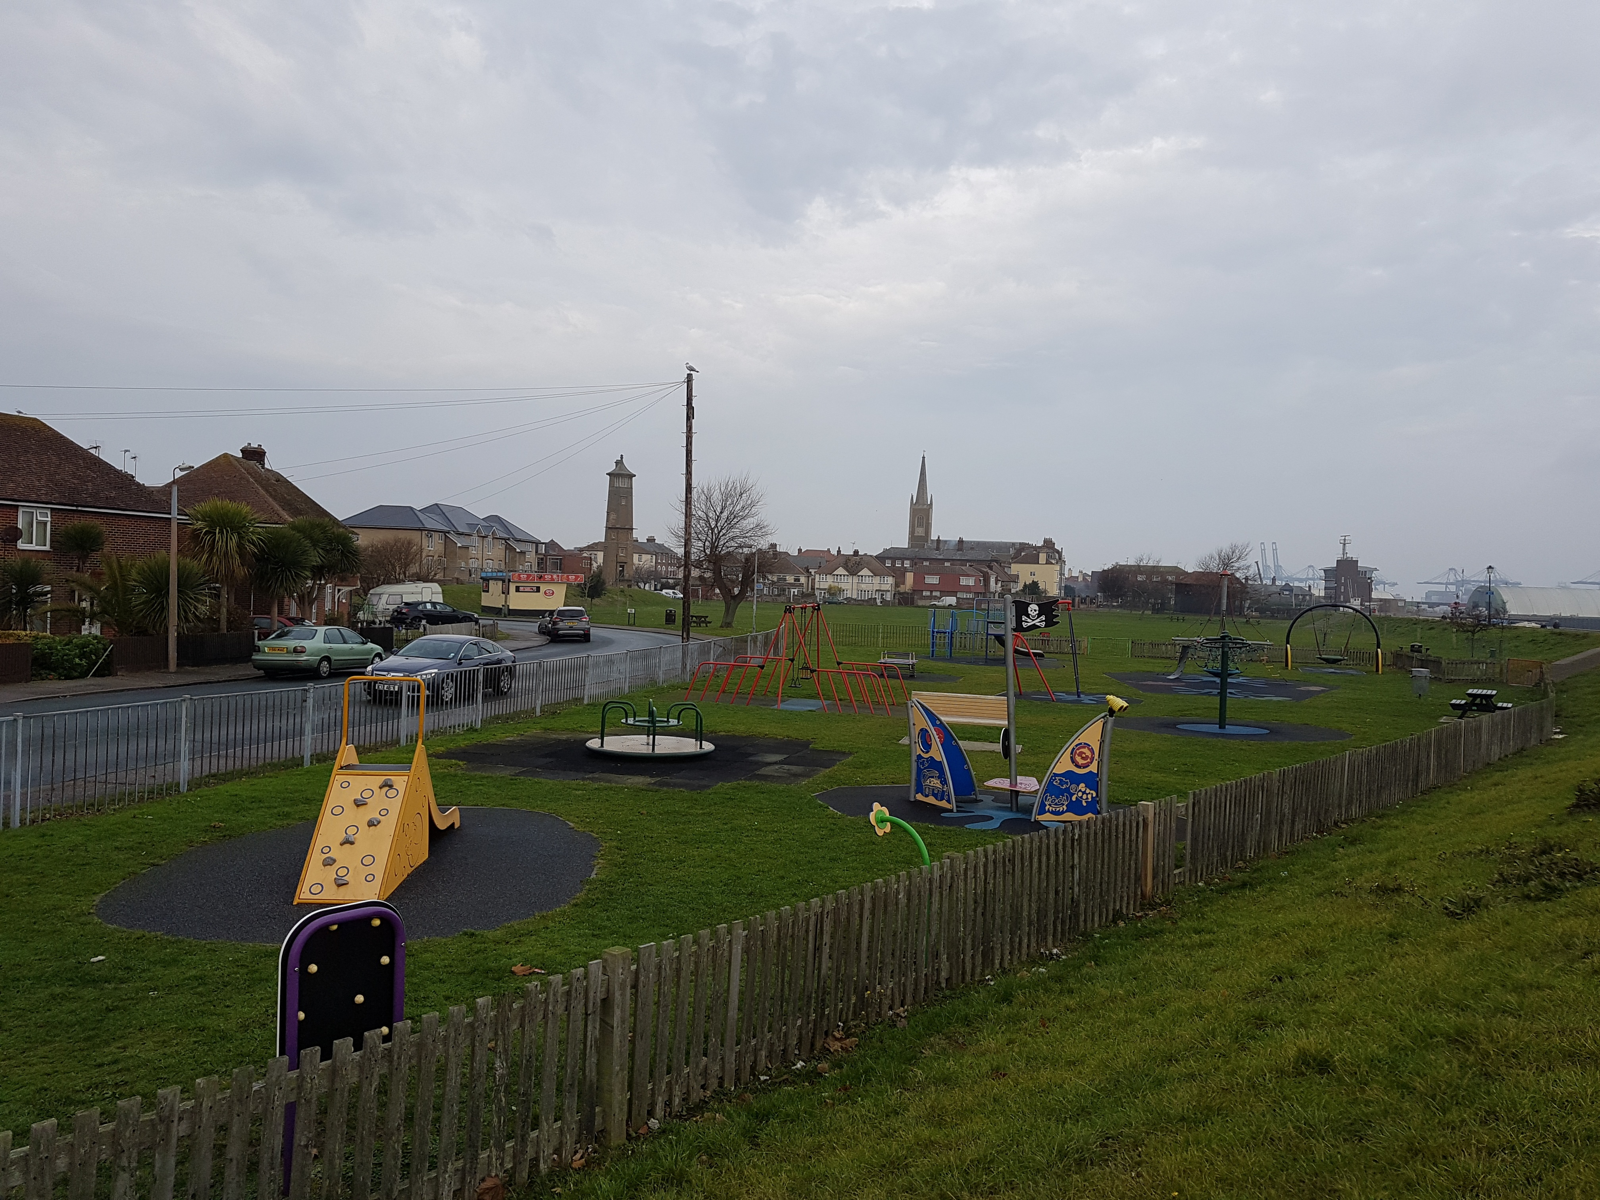 Harwich Peninsula Playground